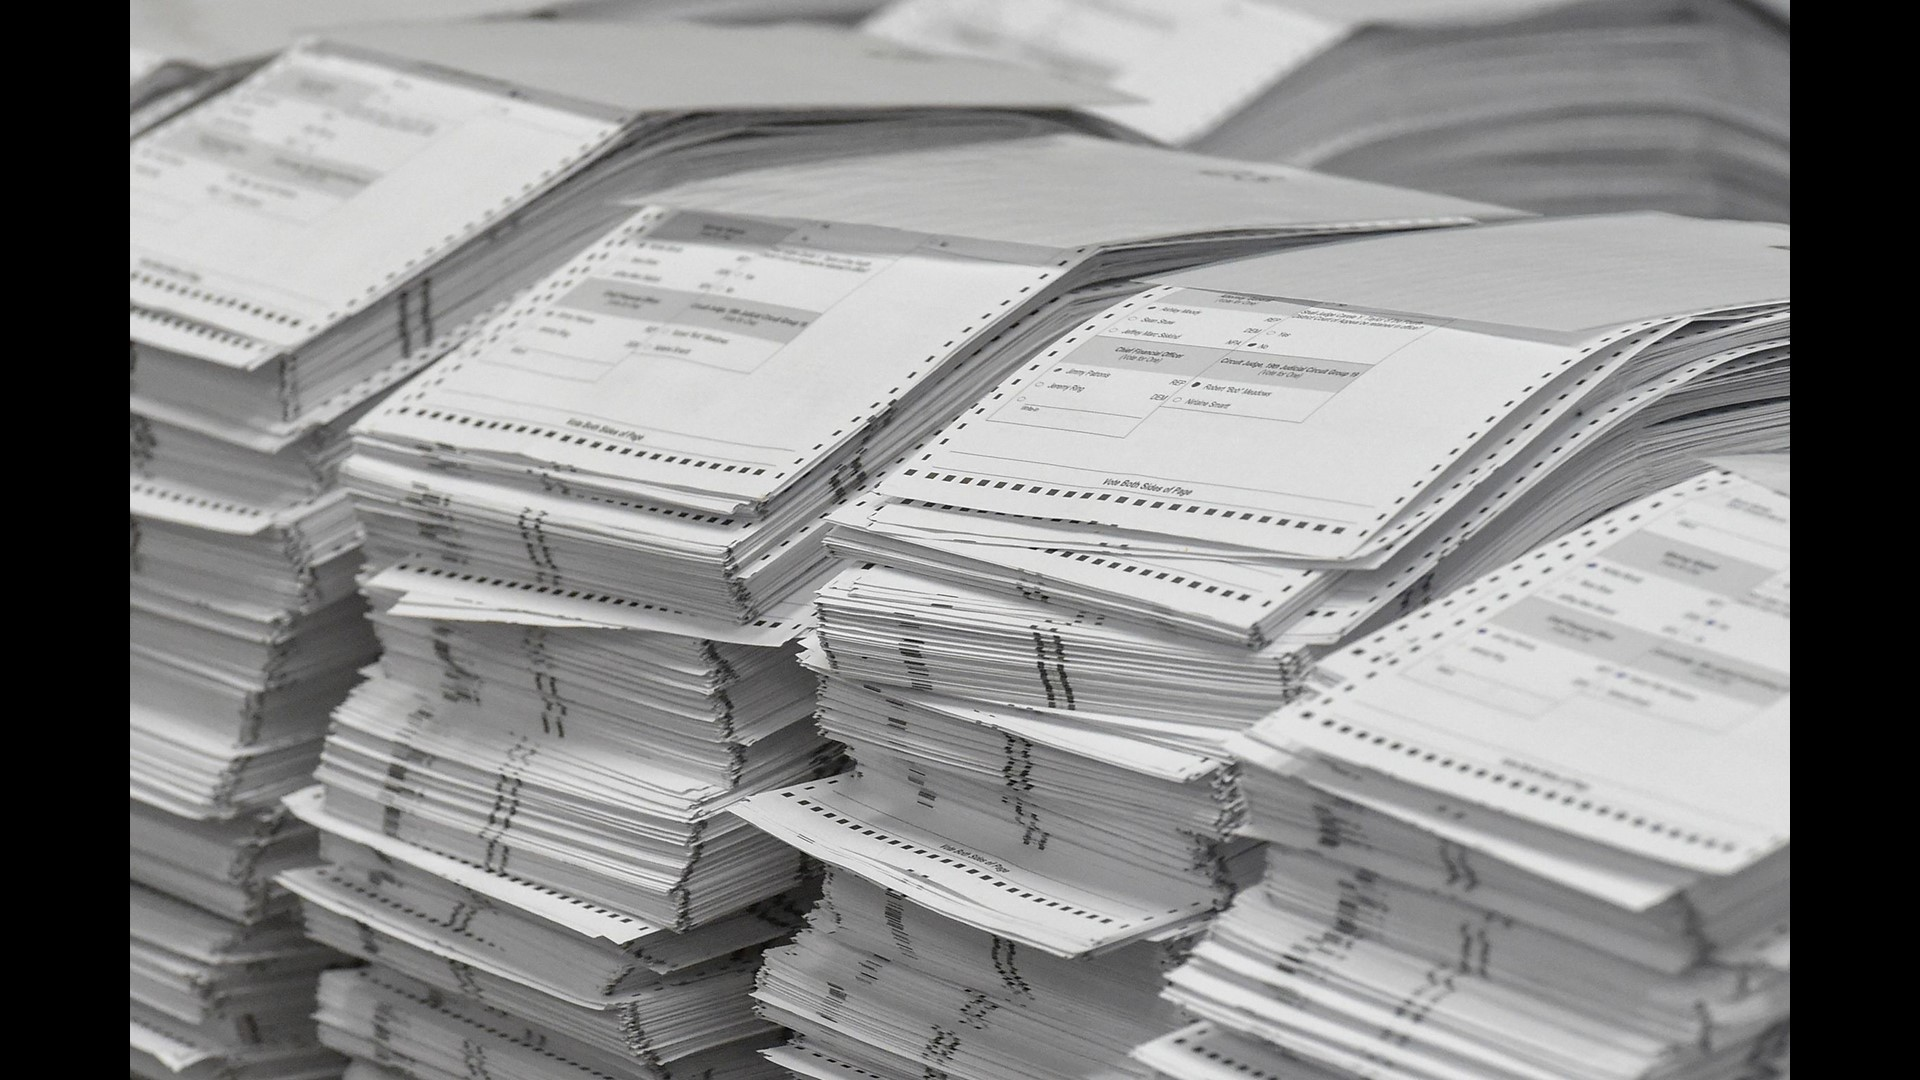 Florida Democrats under investigation for election fraud